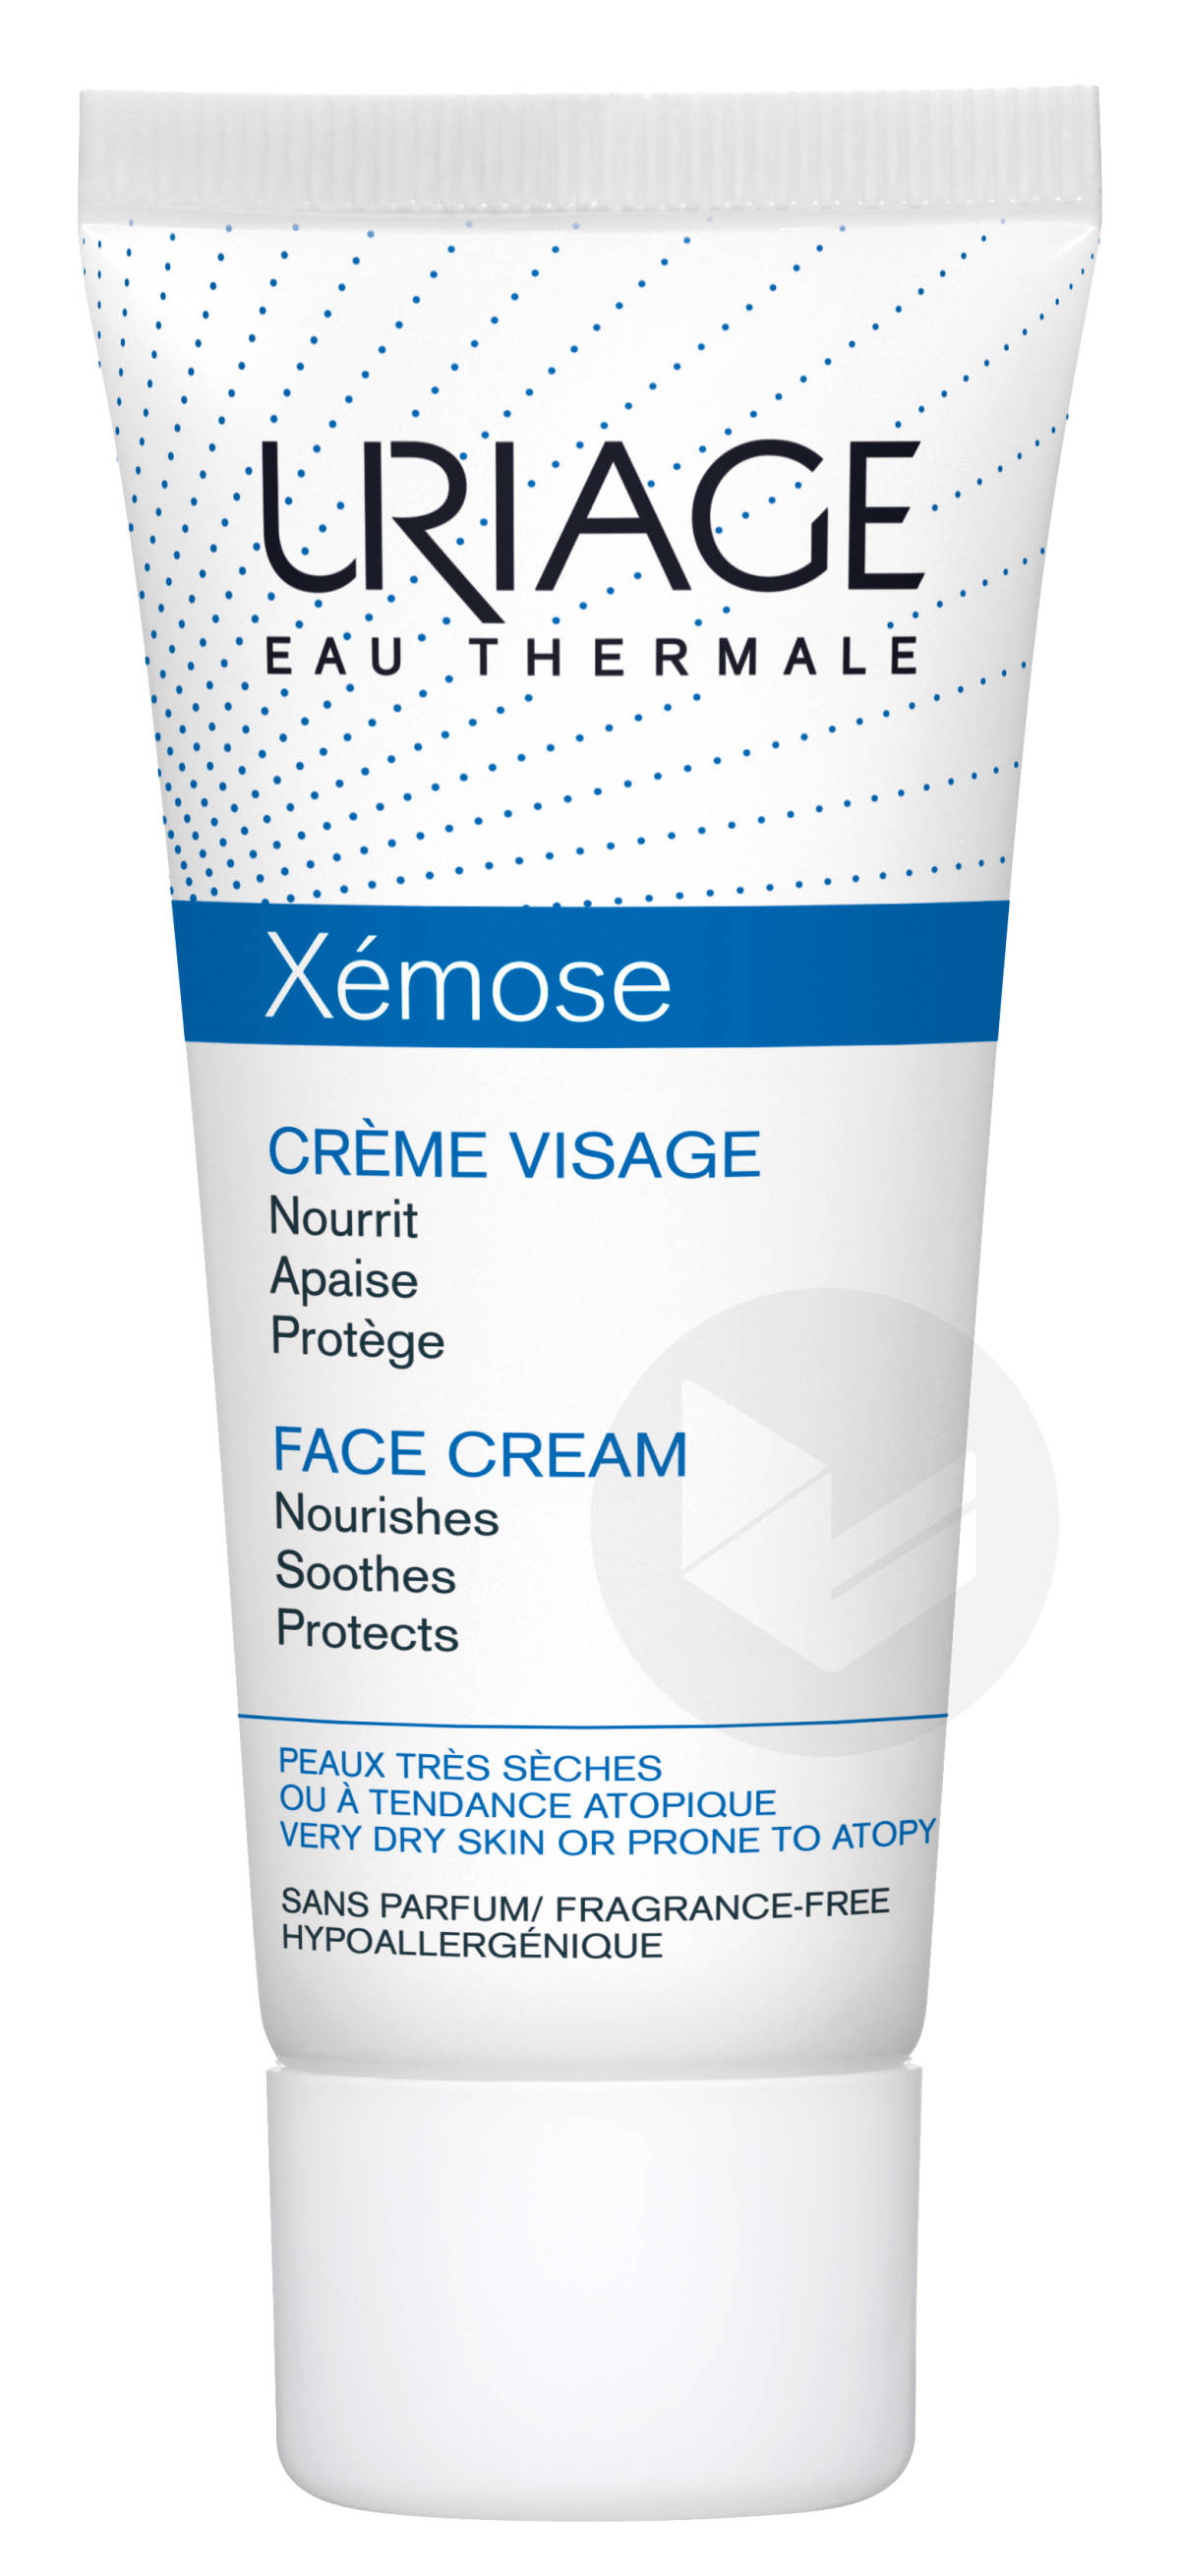 Crème Visage 40ml